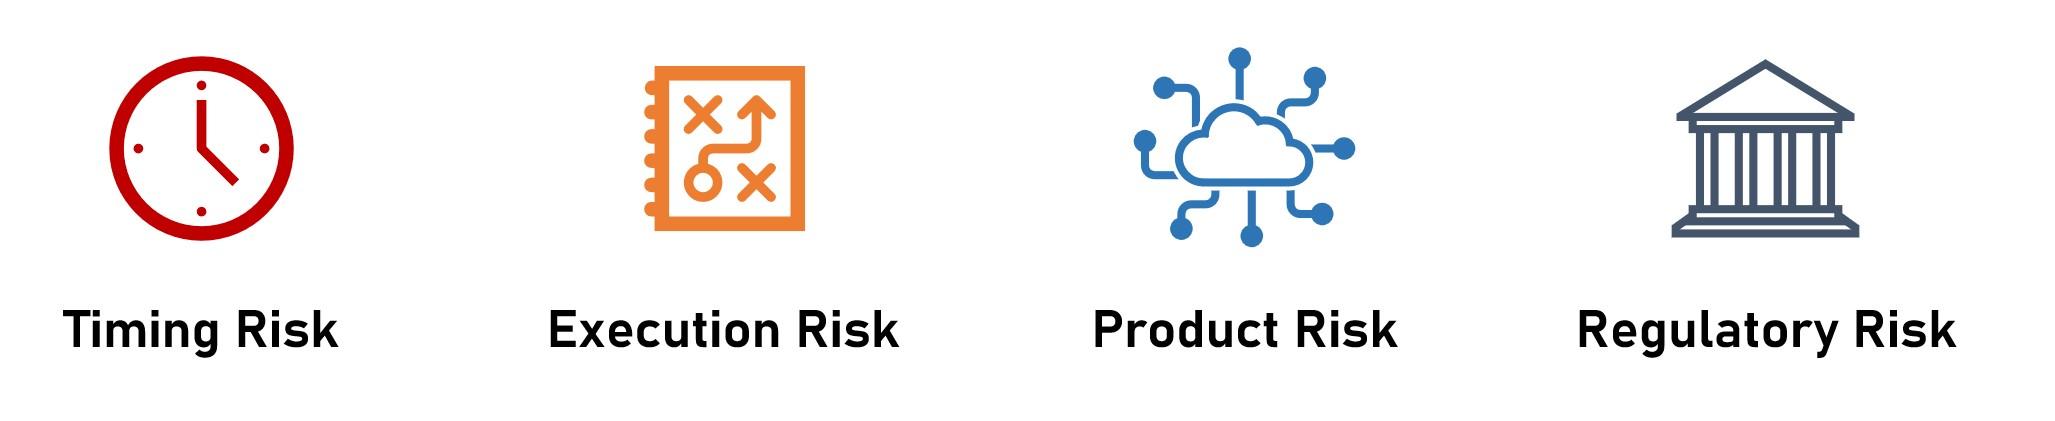 Venture Capital Diligence: Risk Analysis